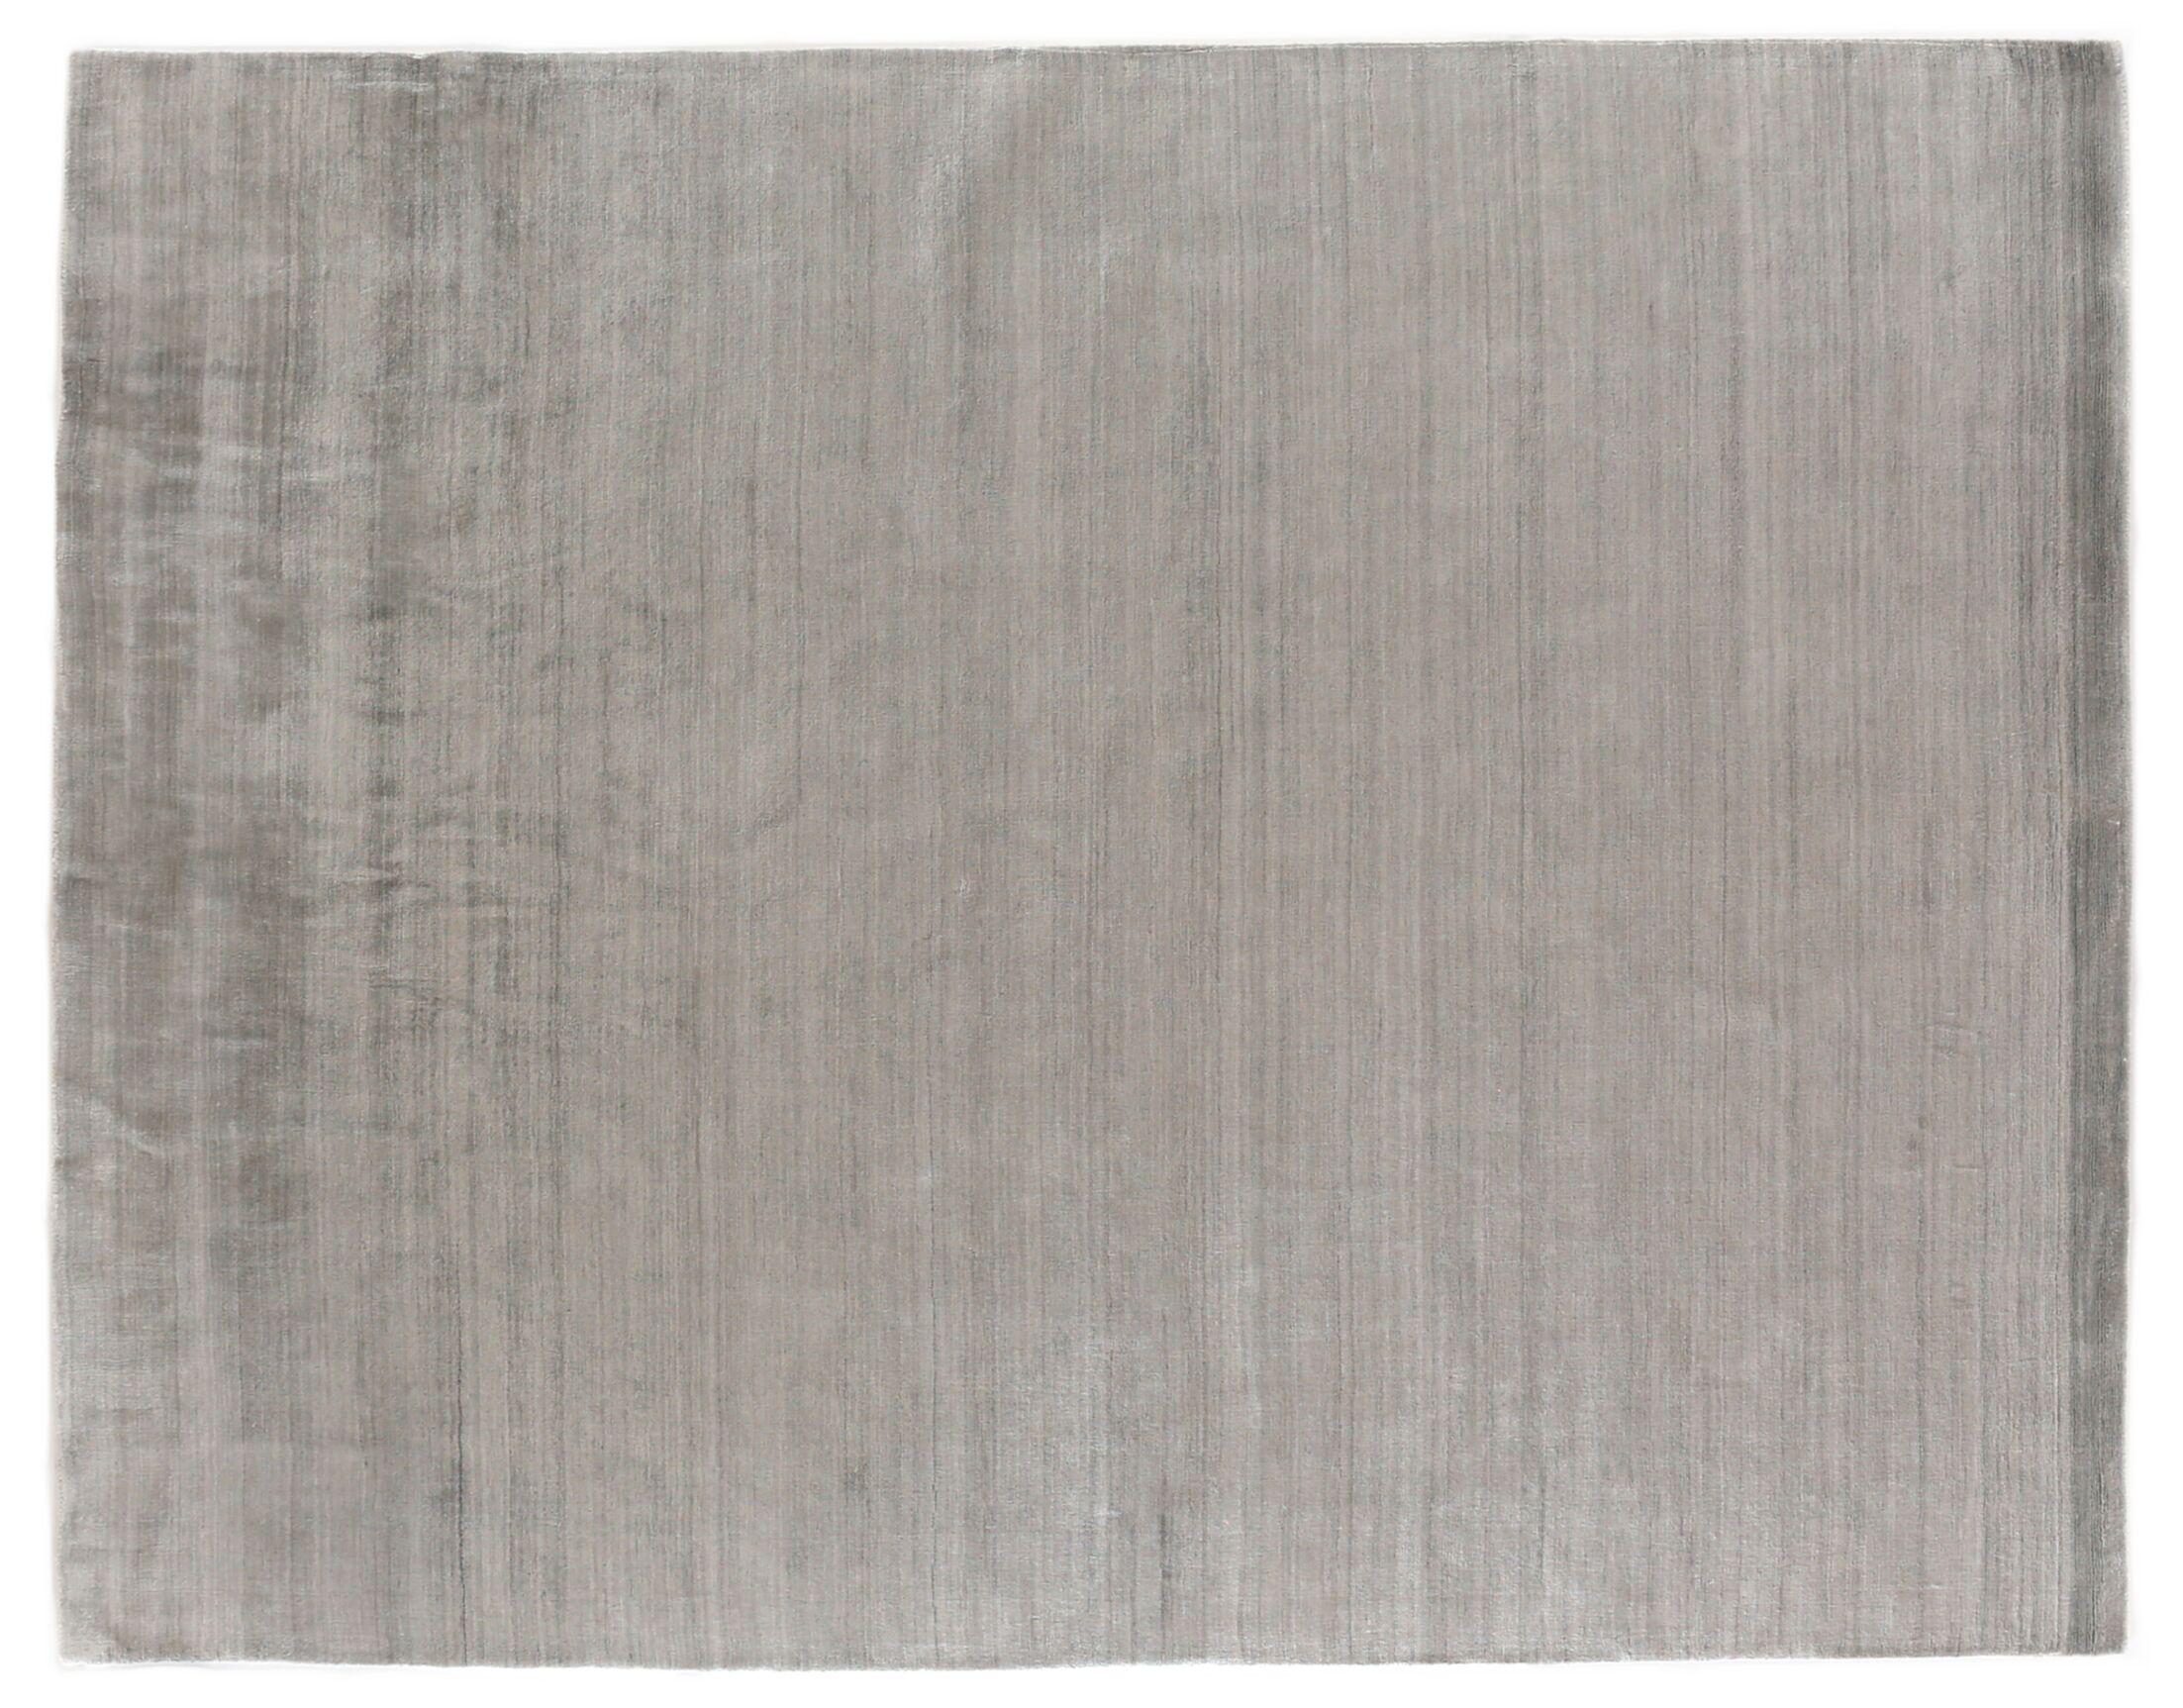 Sanctuary Hand Woven Silk Gray Area Rug Rug Size: Rectangle 14' x 18'